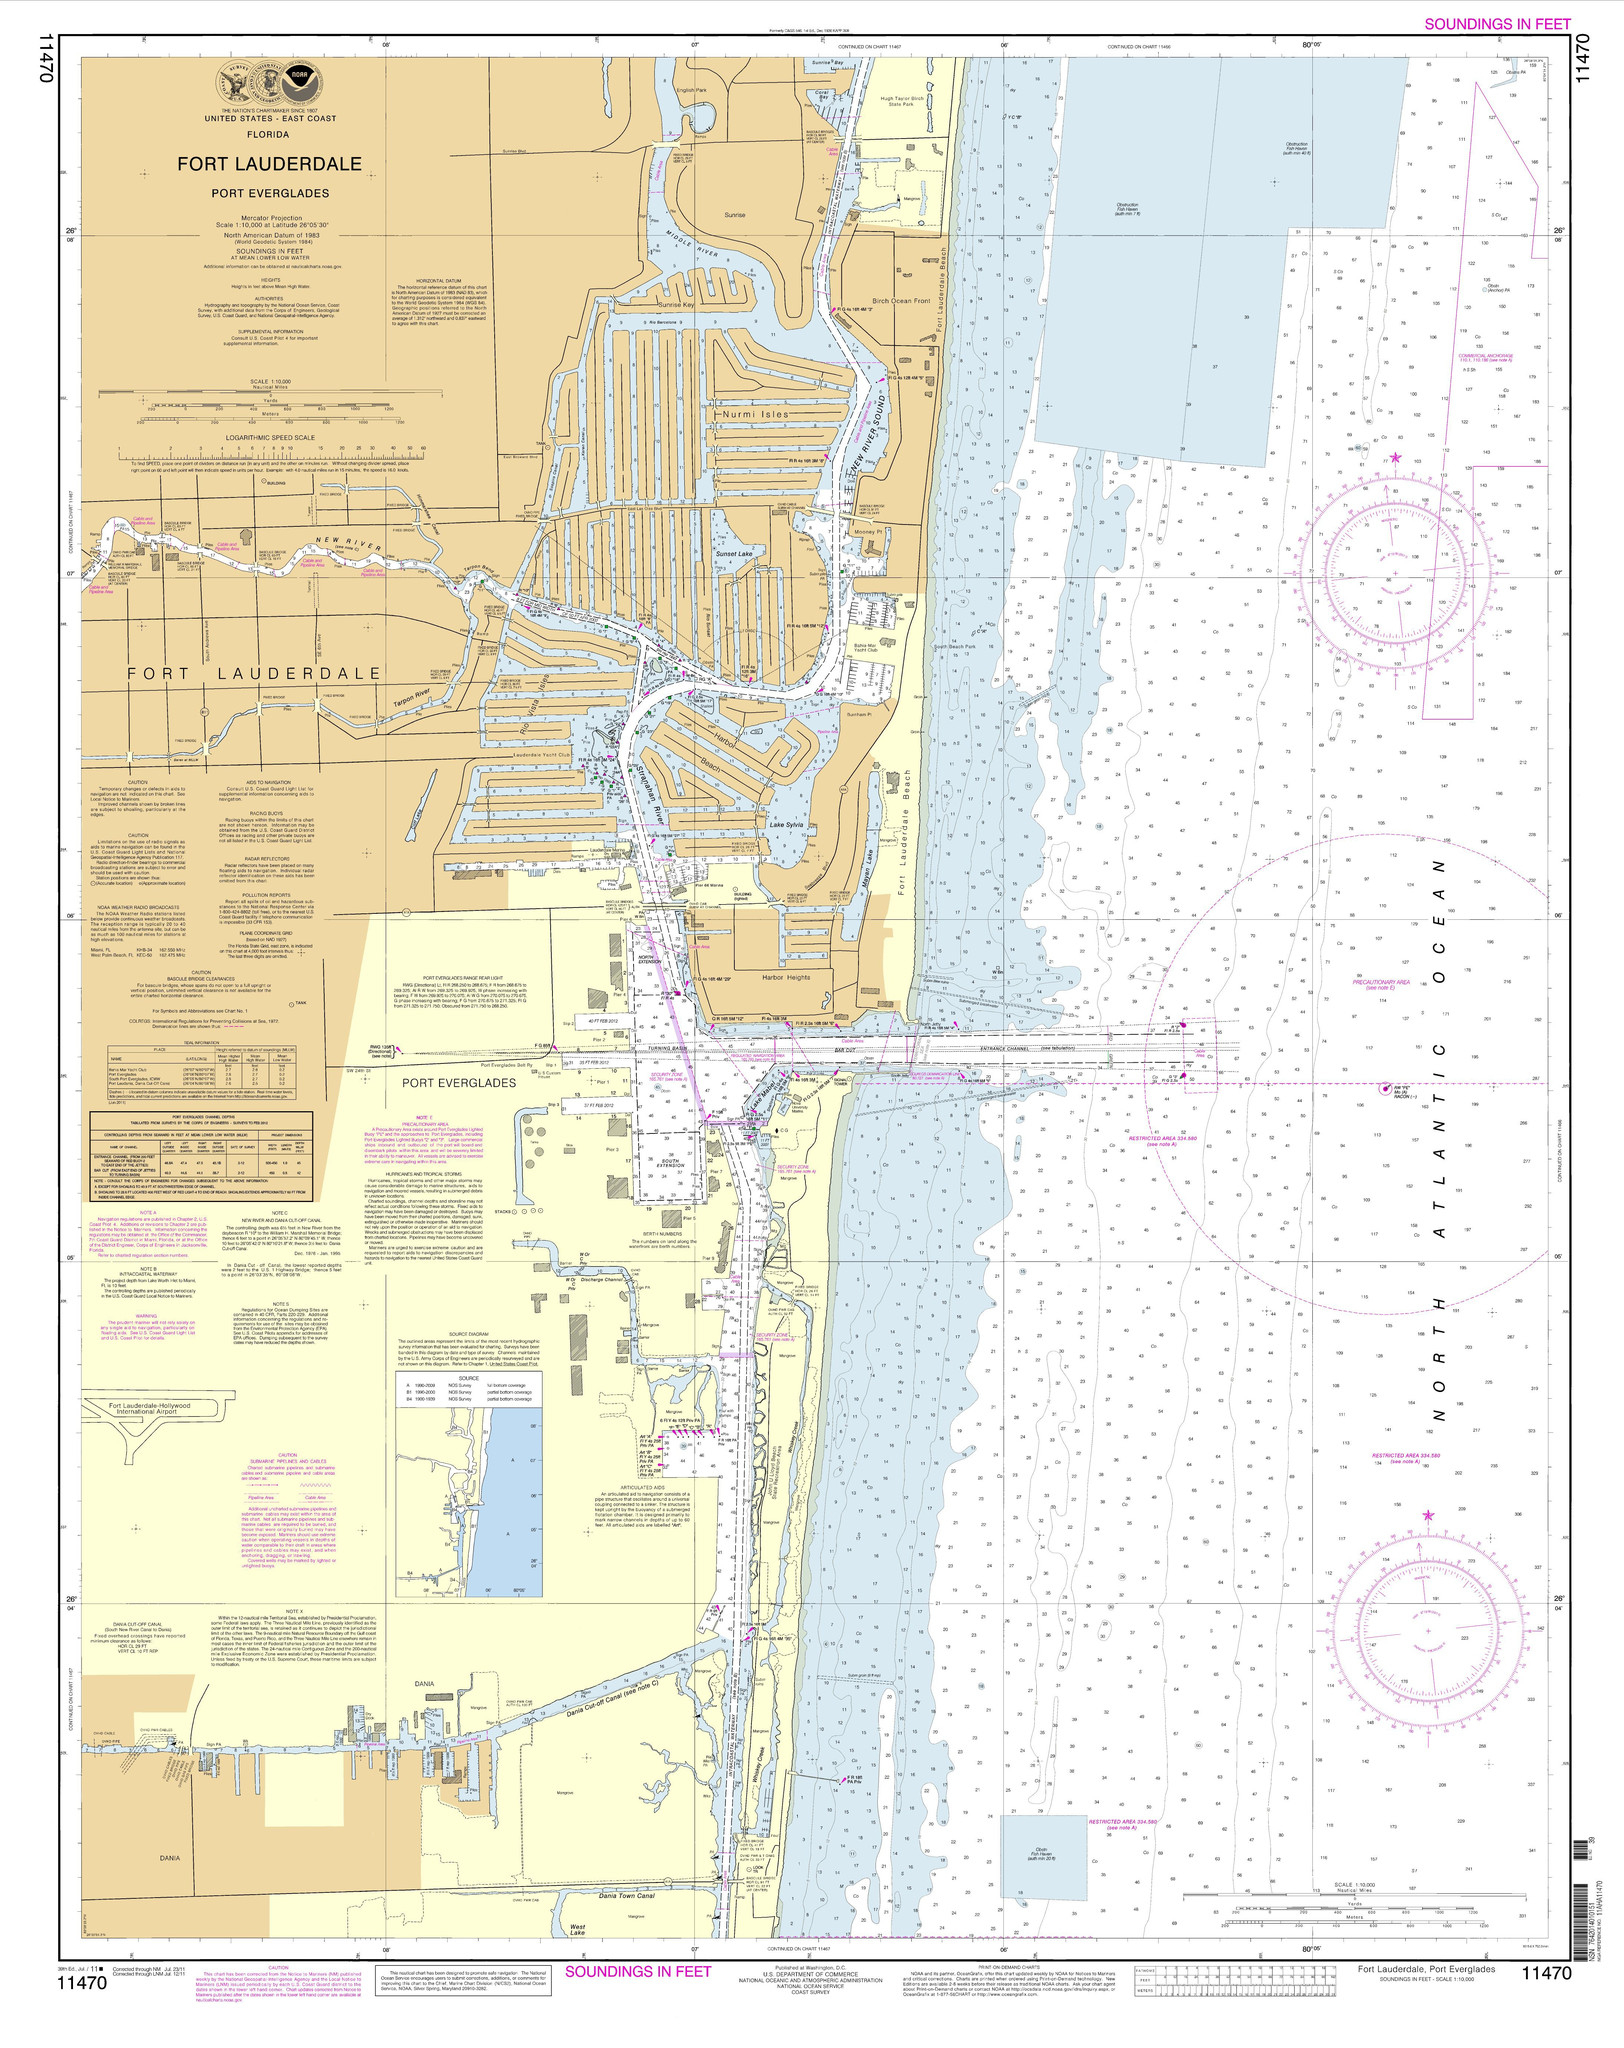 Noaa Chart 11470 Fort Lauderdale Port Everglades - Port Everglades Florida Map